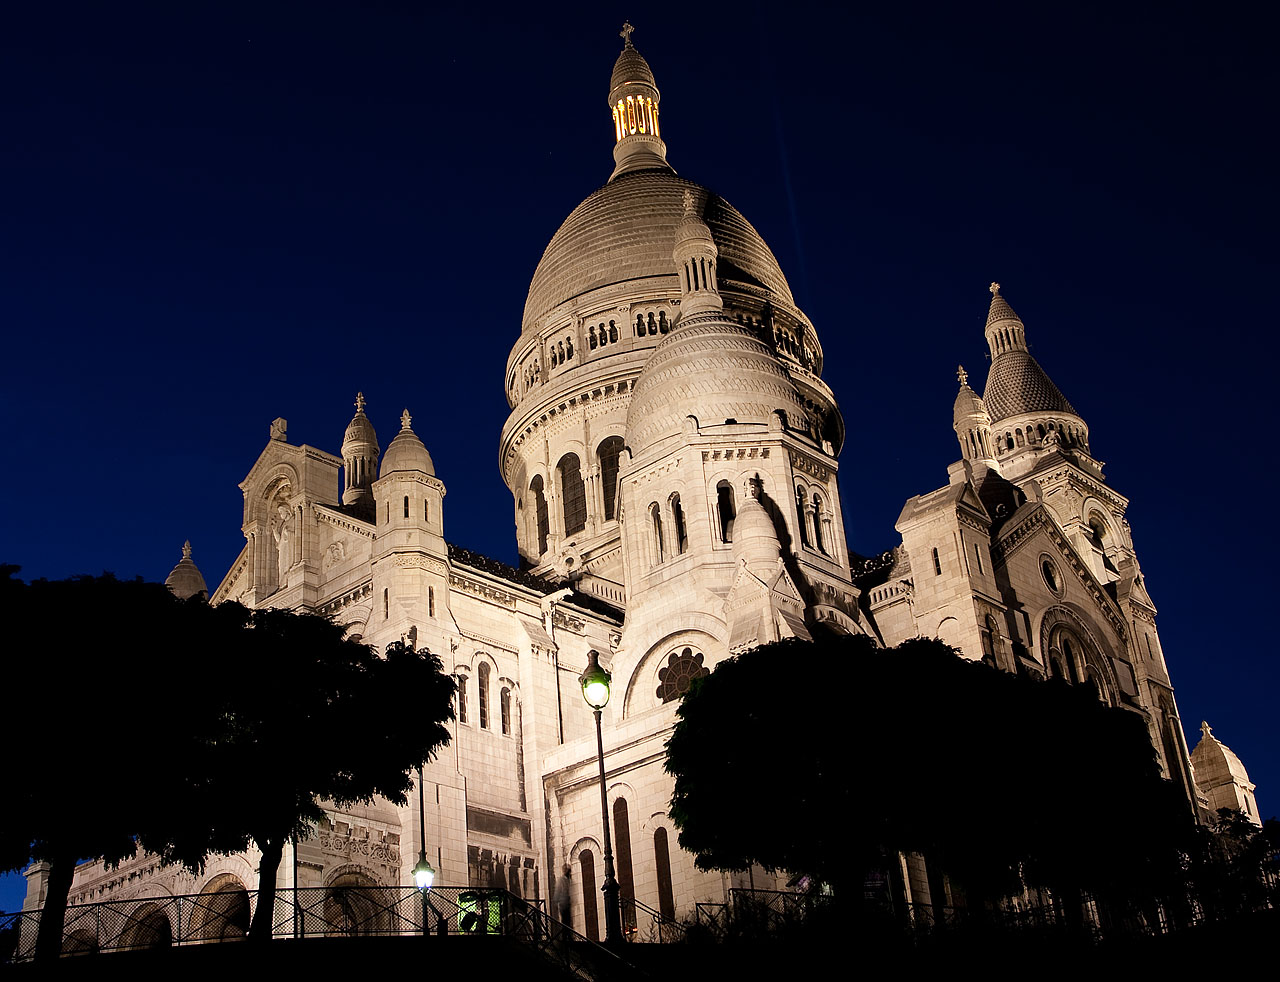 http://www.tunliweb.no/Bilder_SM/_album_Paris/d02a.jpg